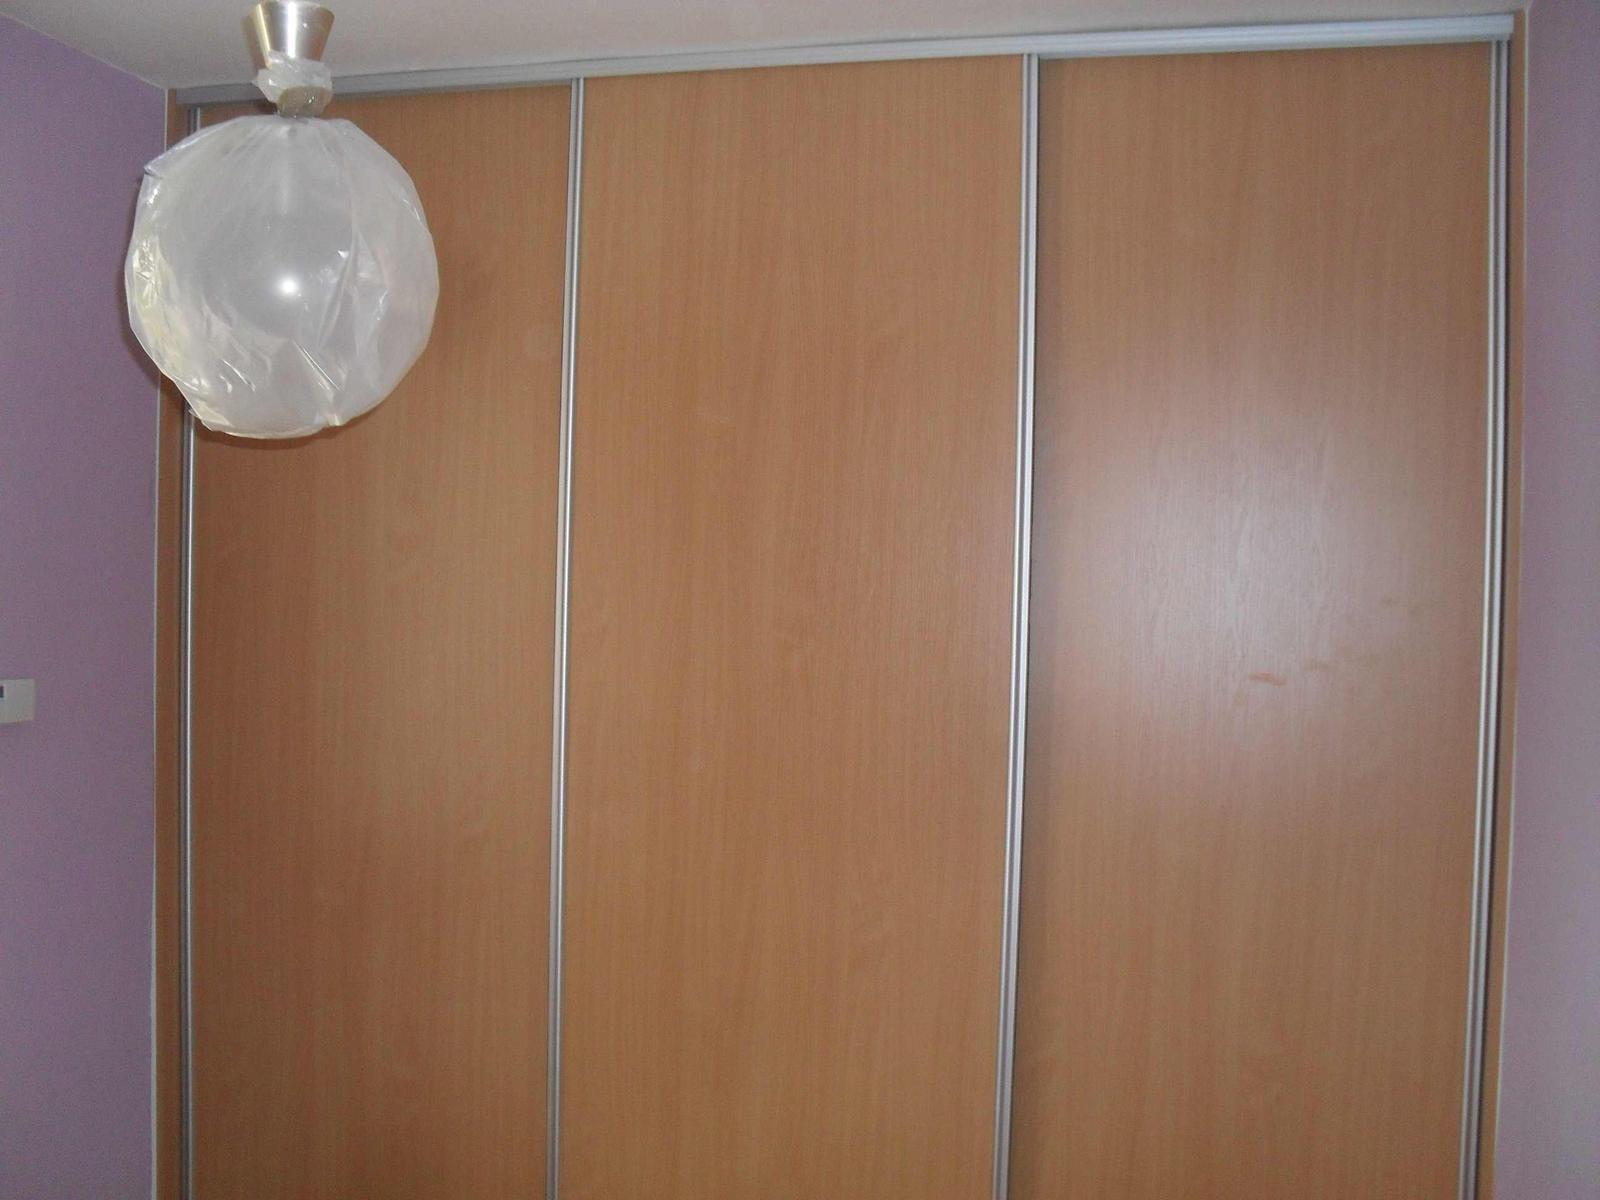 Vstavané skrine Martin Benko Bošany - Obrázok č. 23